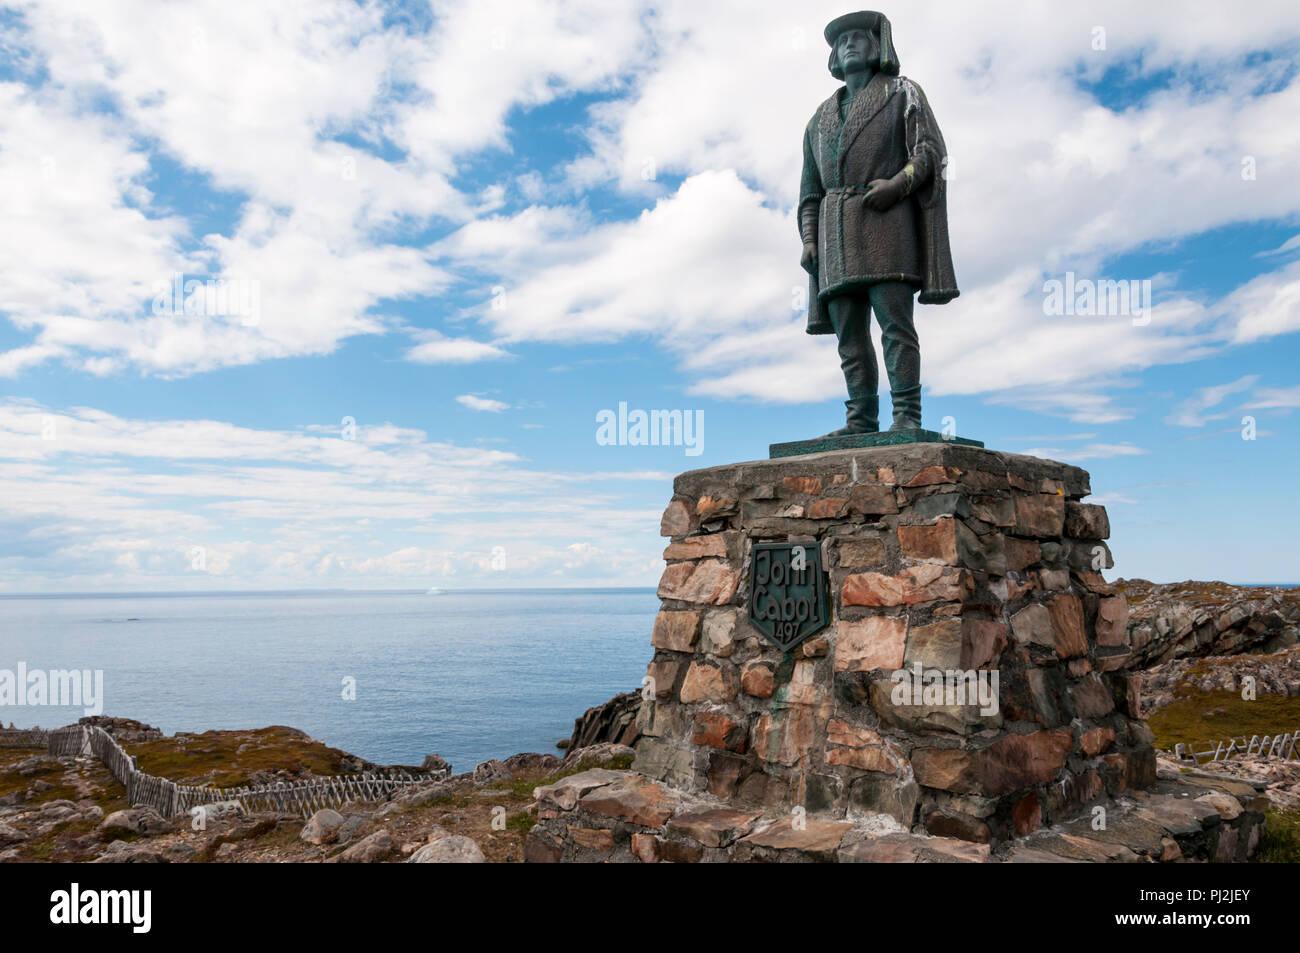 Statue of John Cabot at Cape Bonavista, Newfoundland. - Stock Image